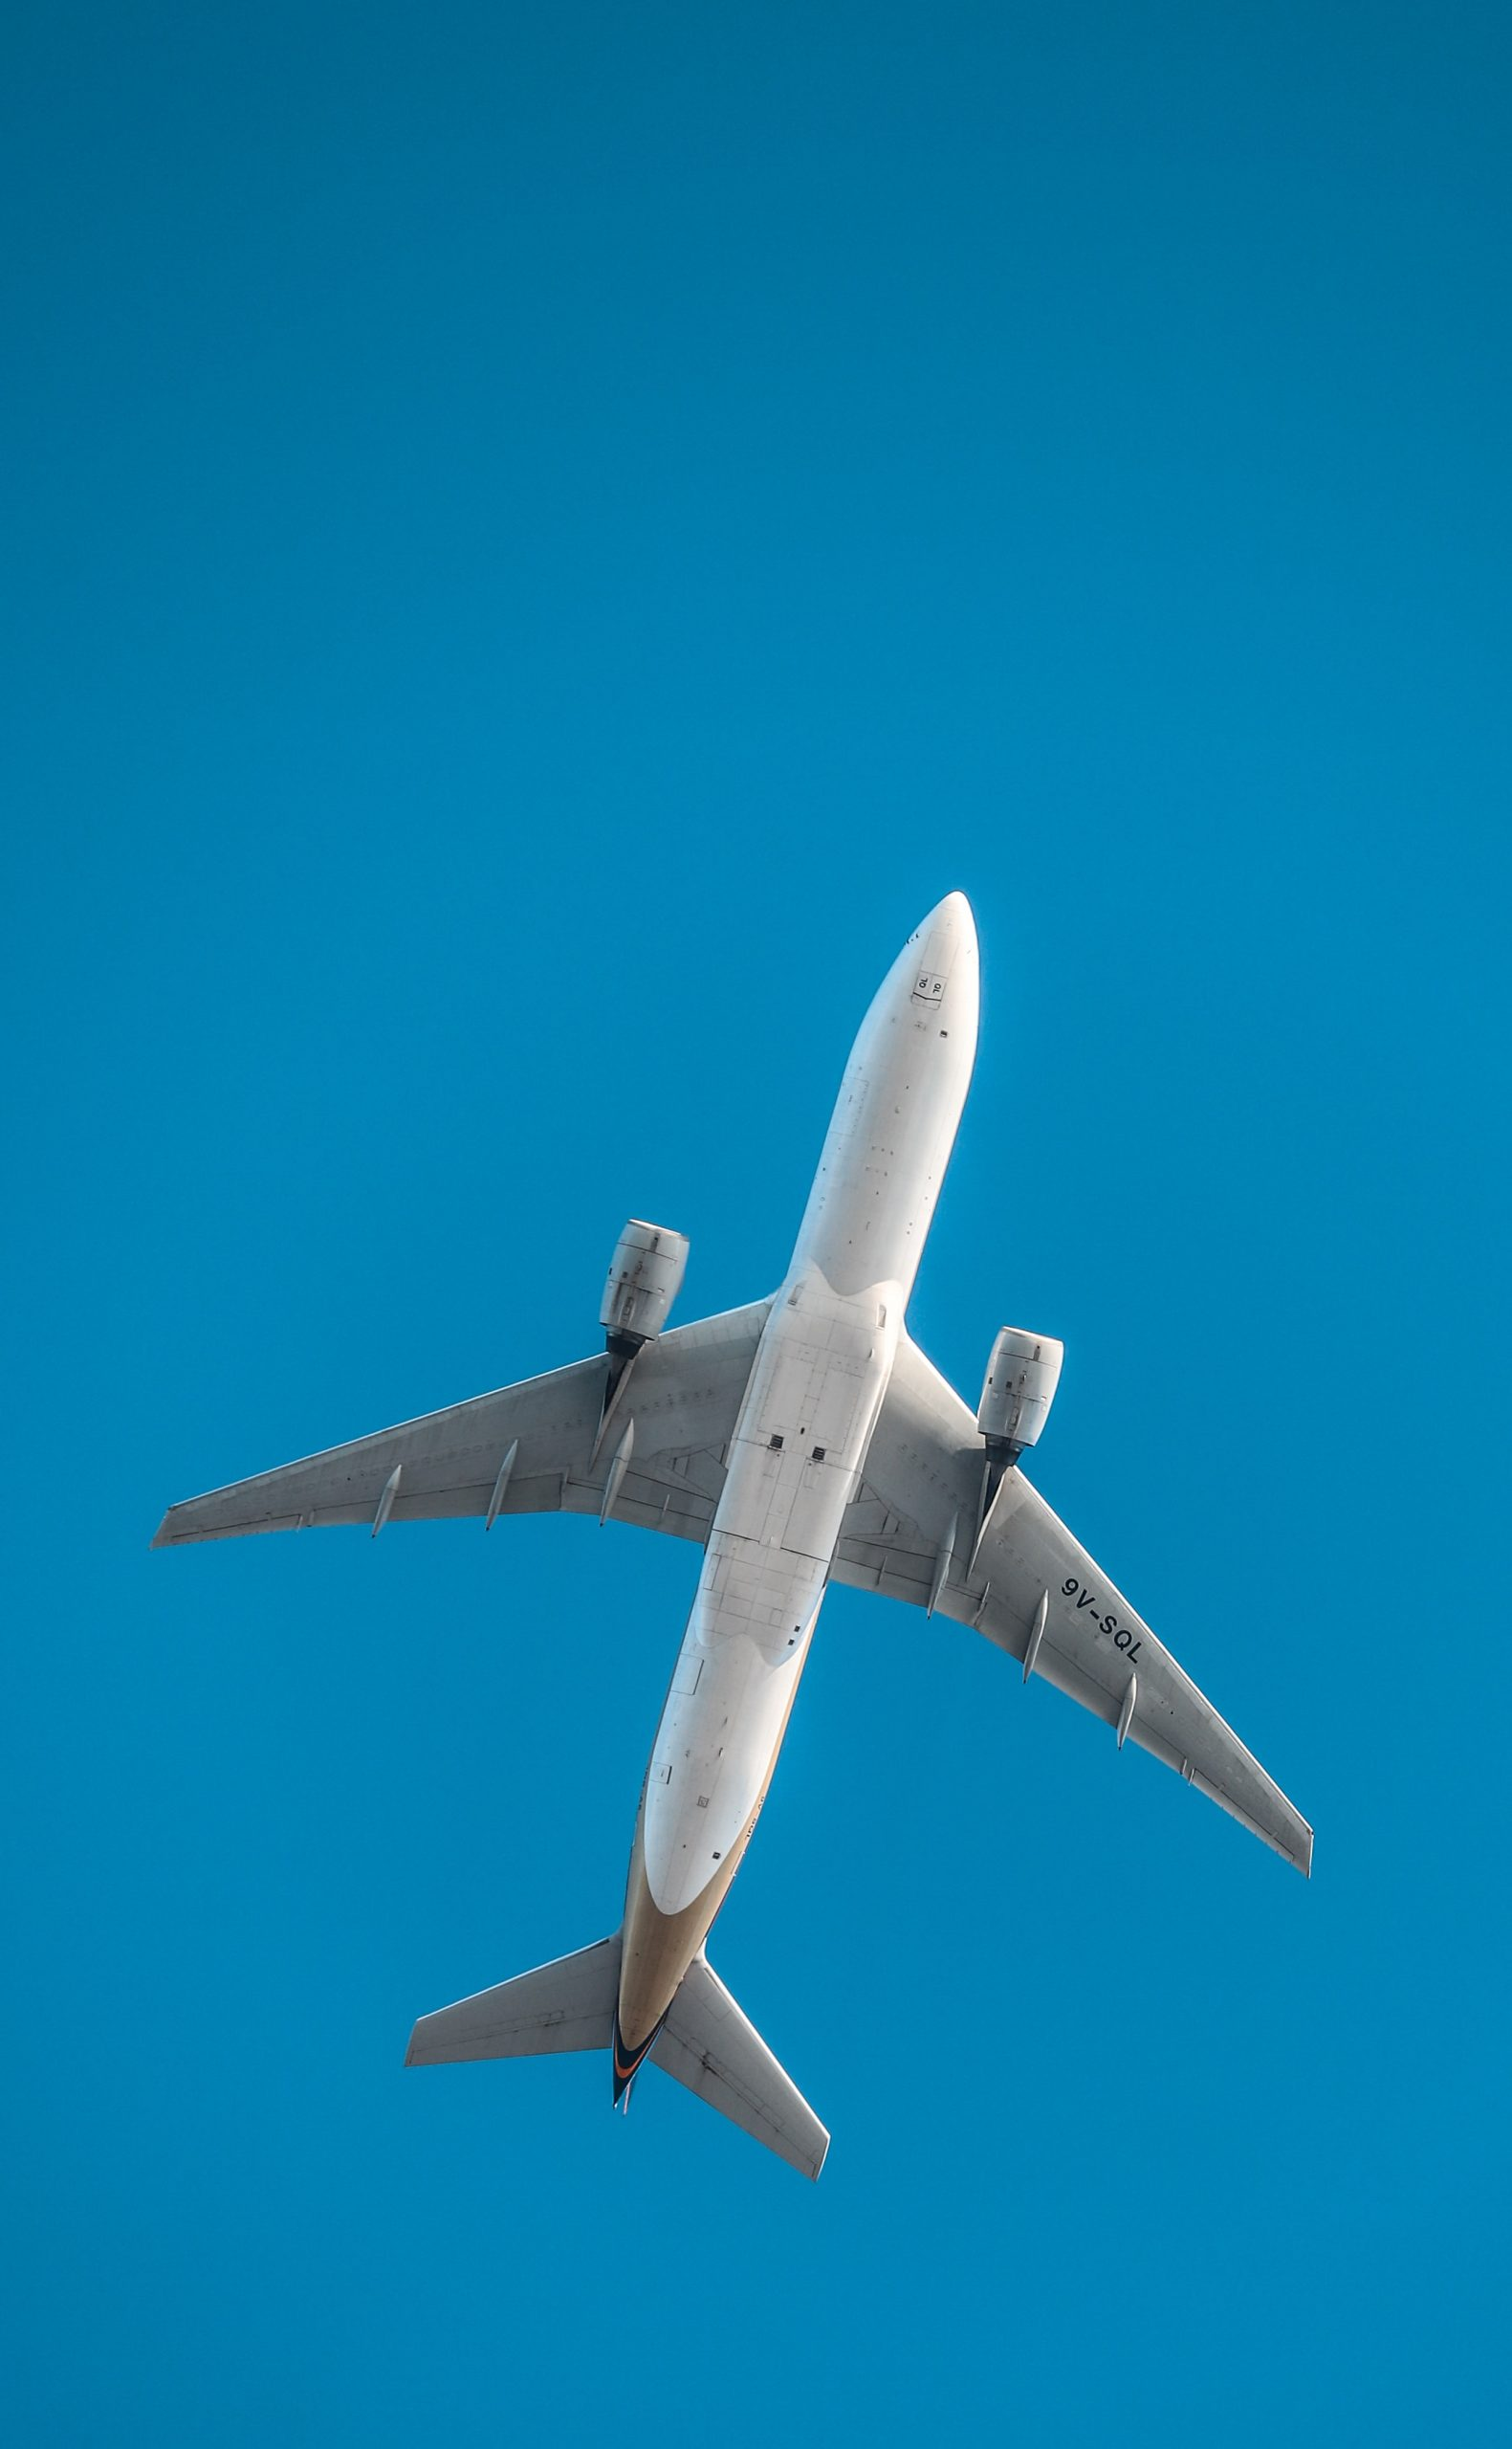 Aero Guard Aviation Insurance